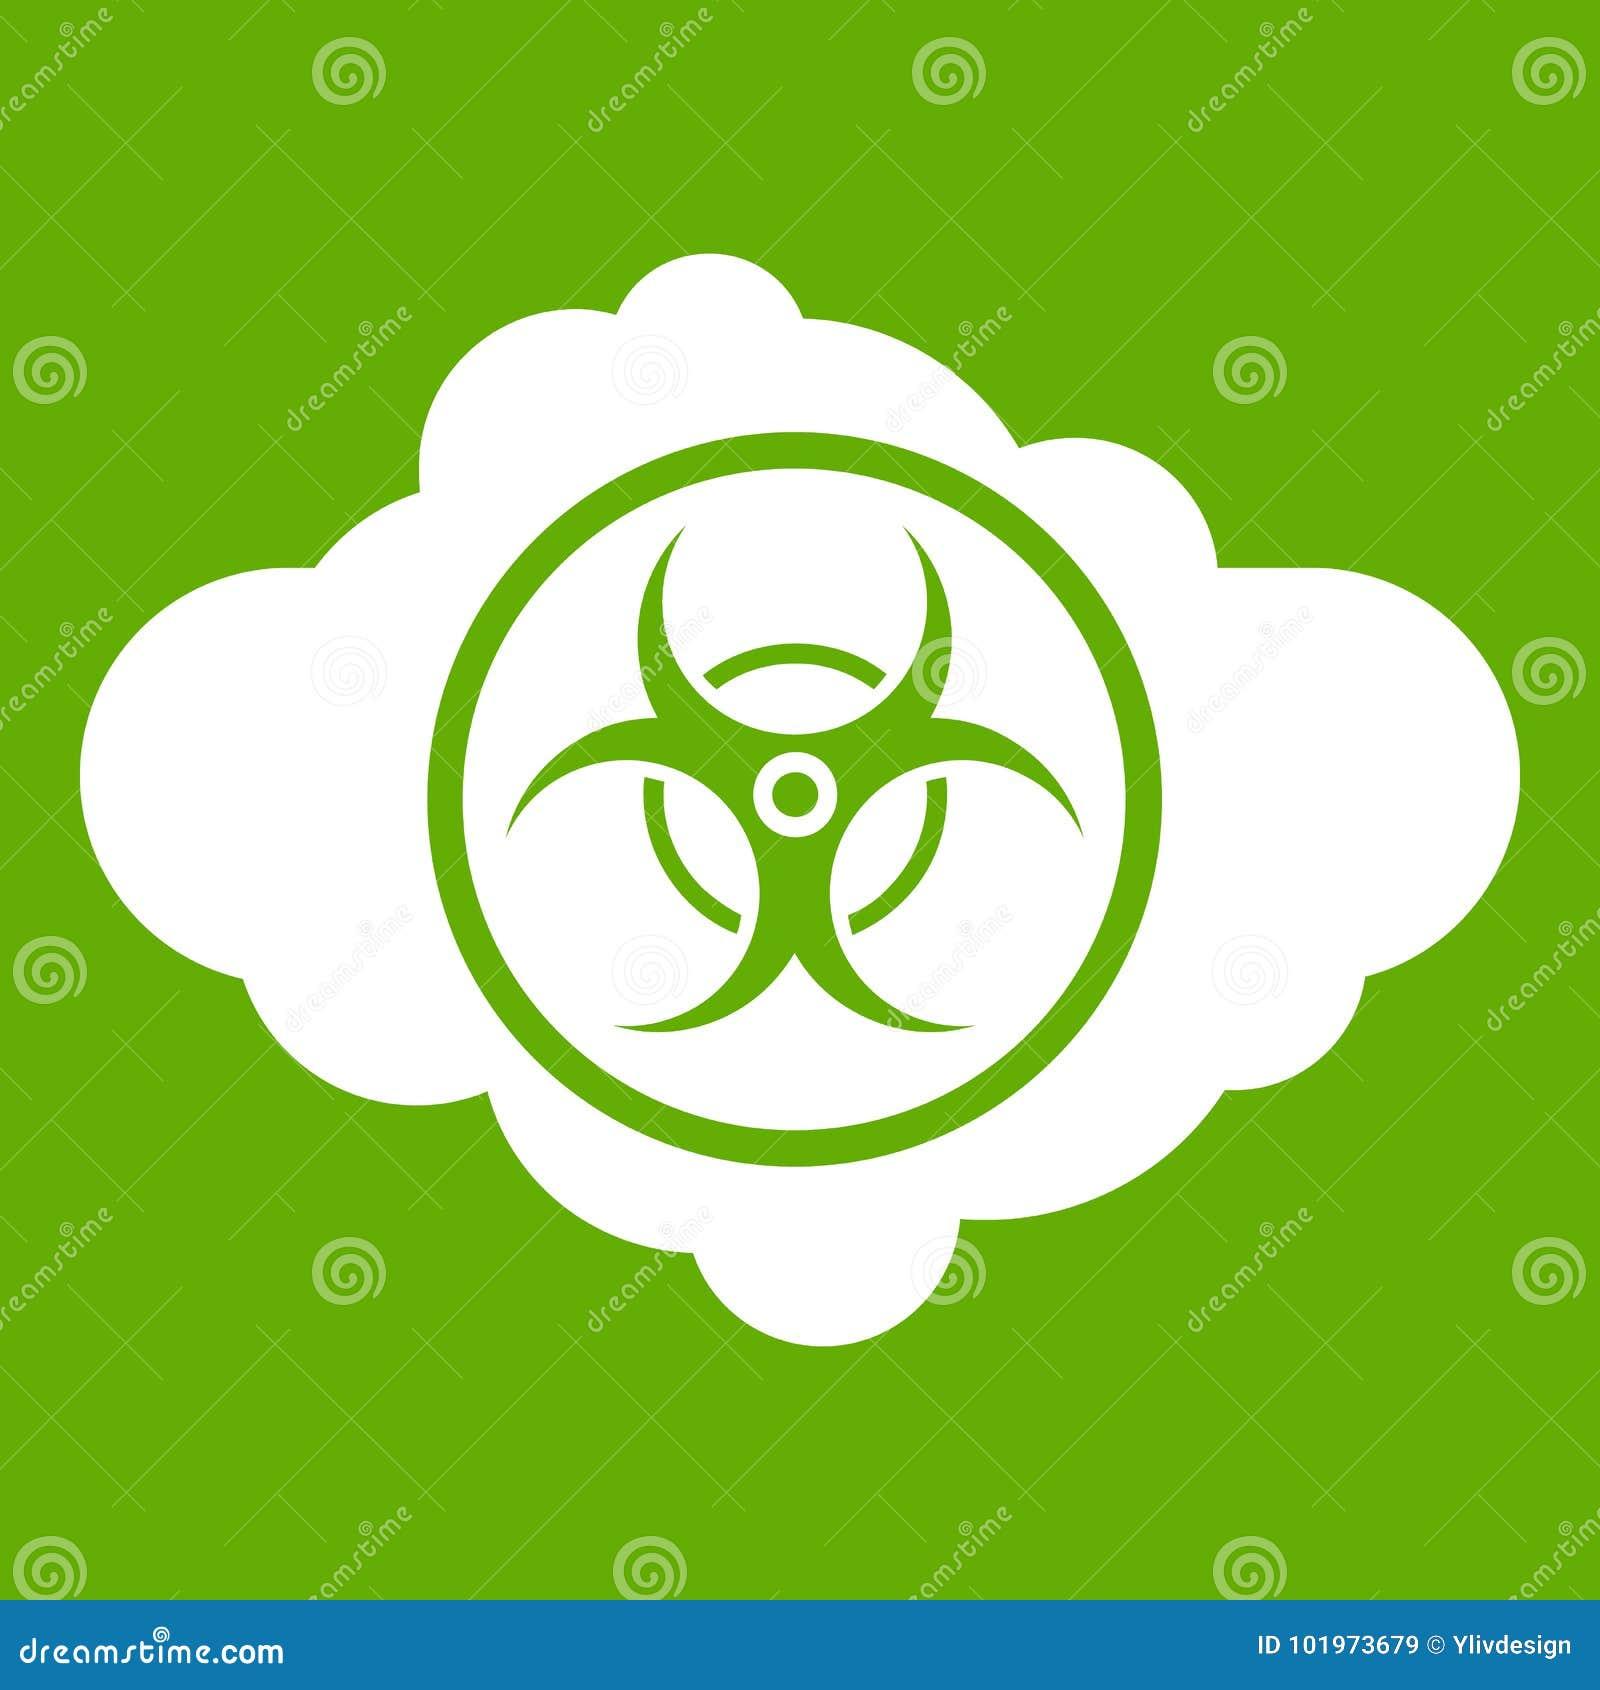 Cloud With Biohazard Symbol Icon Green Stock Vector Illustration